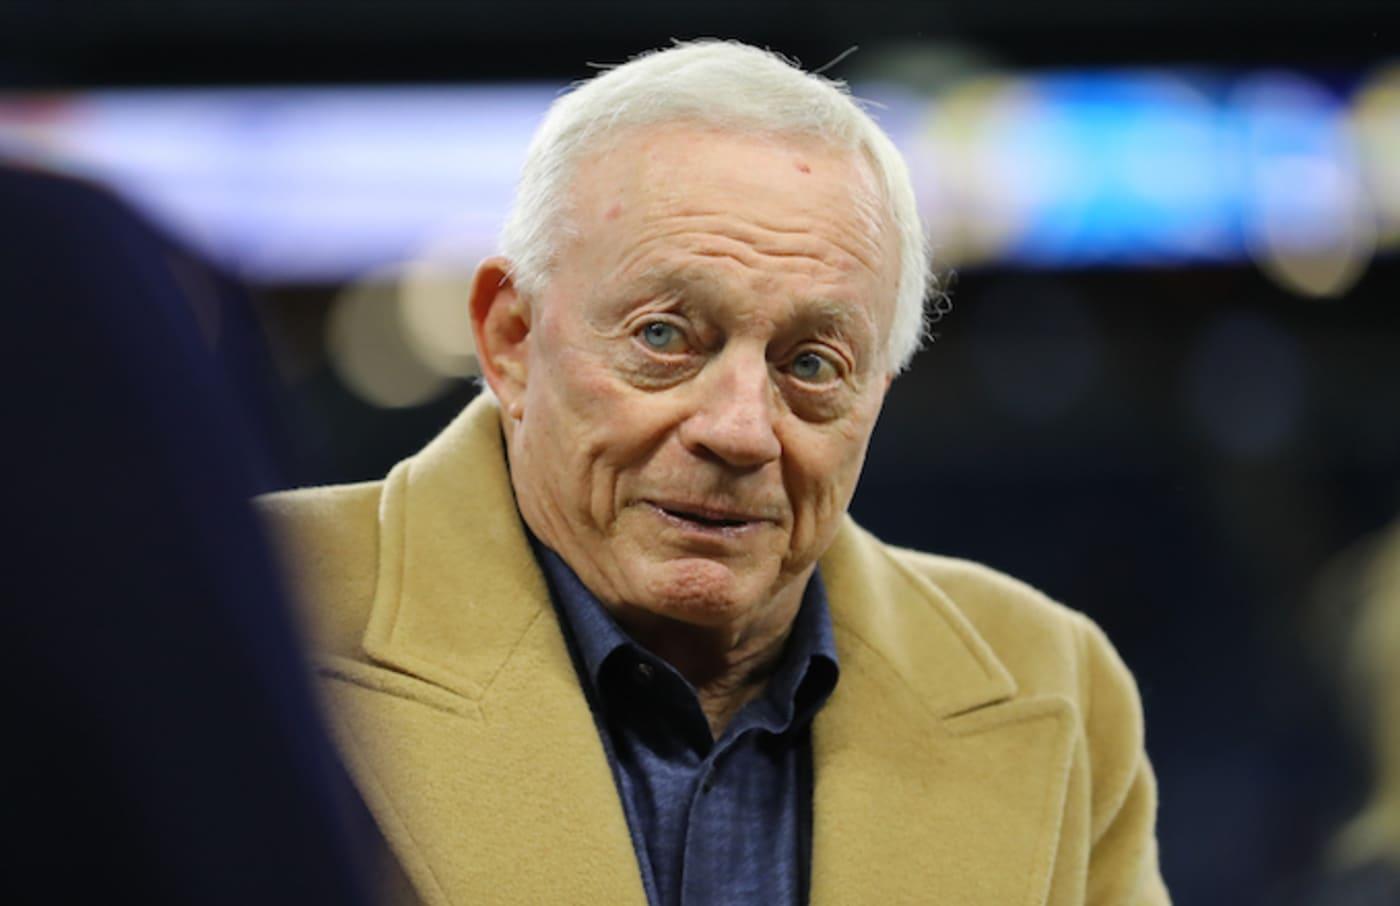 Dallas Cowboys owner Jerry Jones before the game against Detroit Lions.